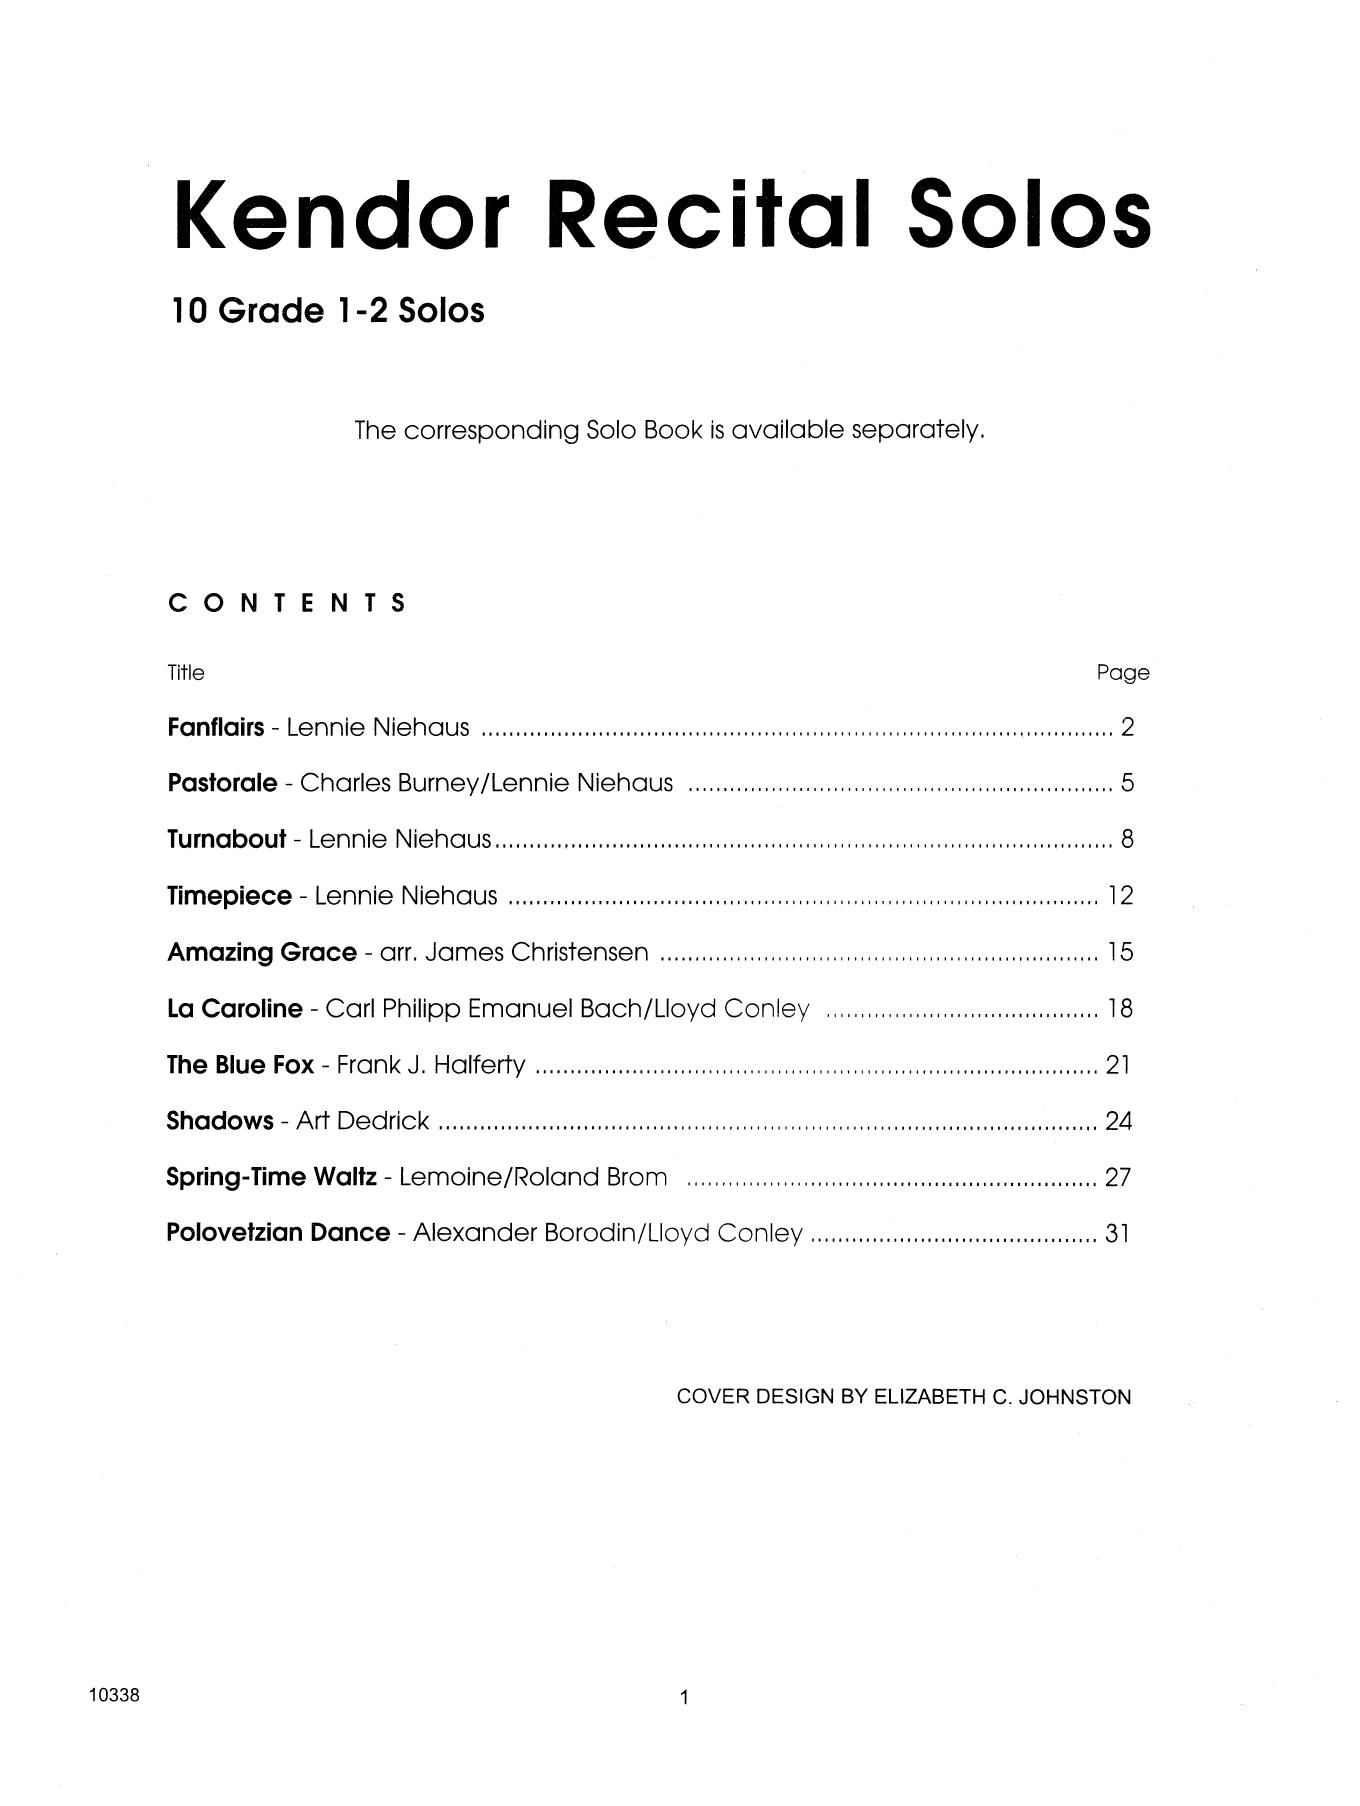 Kendor Recital Solos - Tenor Saxophone (Piano Accompaniment Book Only) Sheet Music